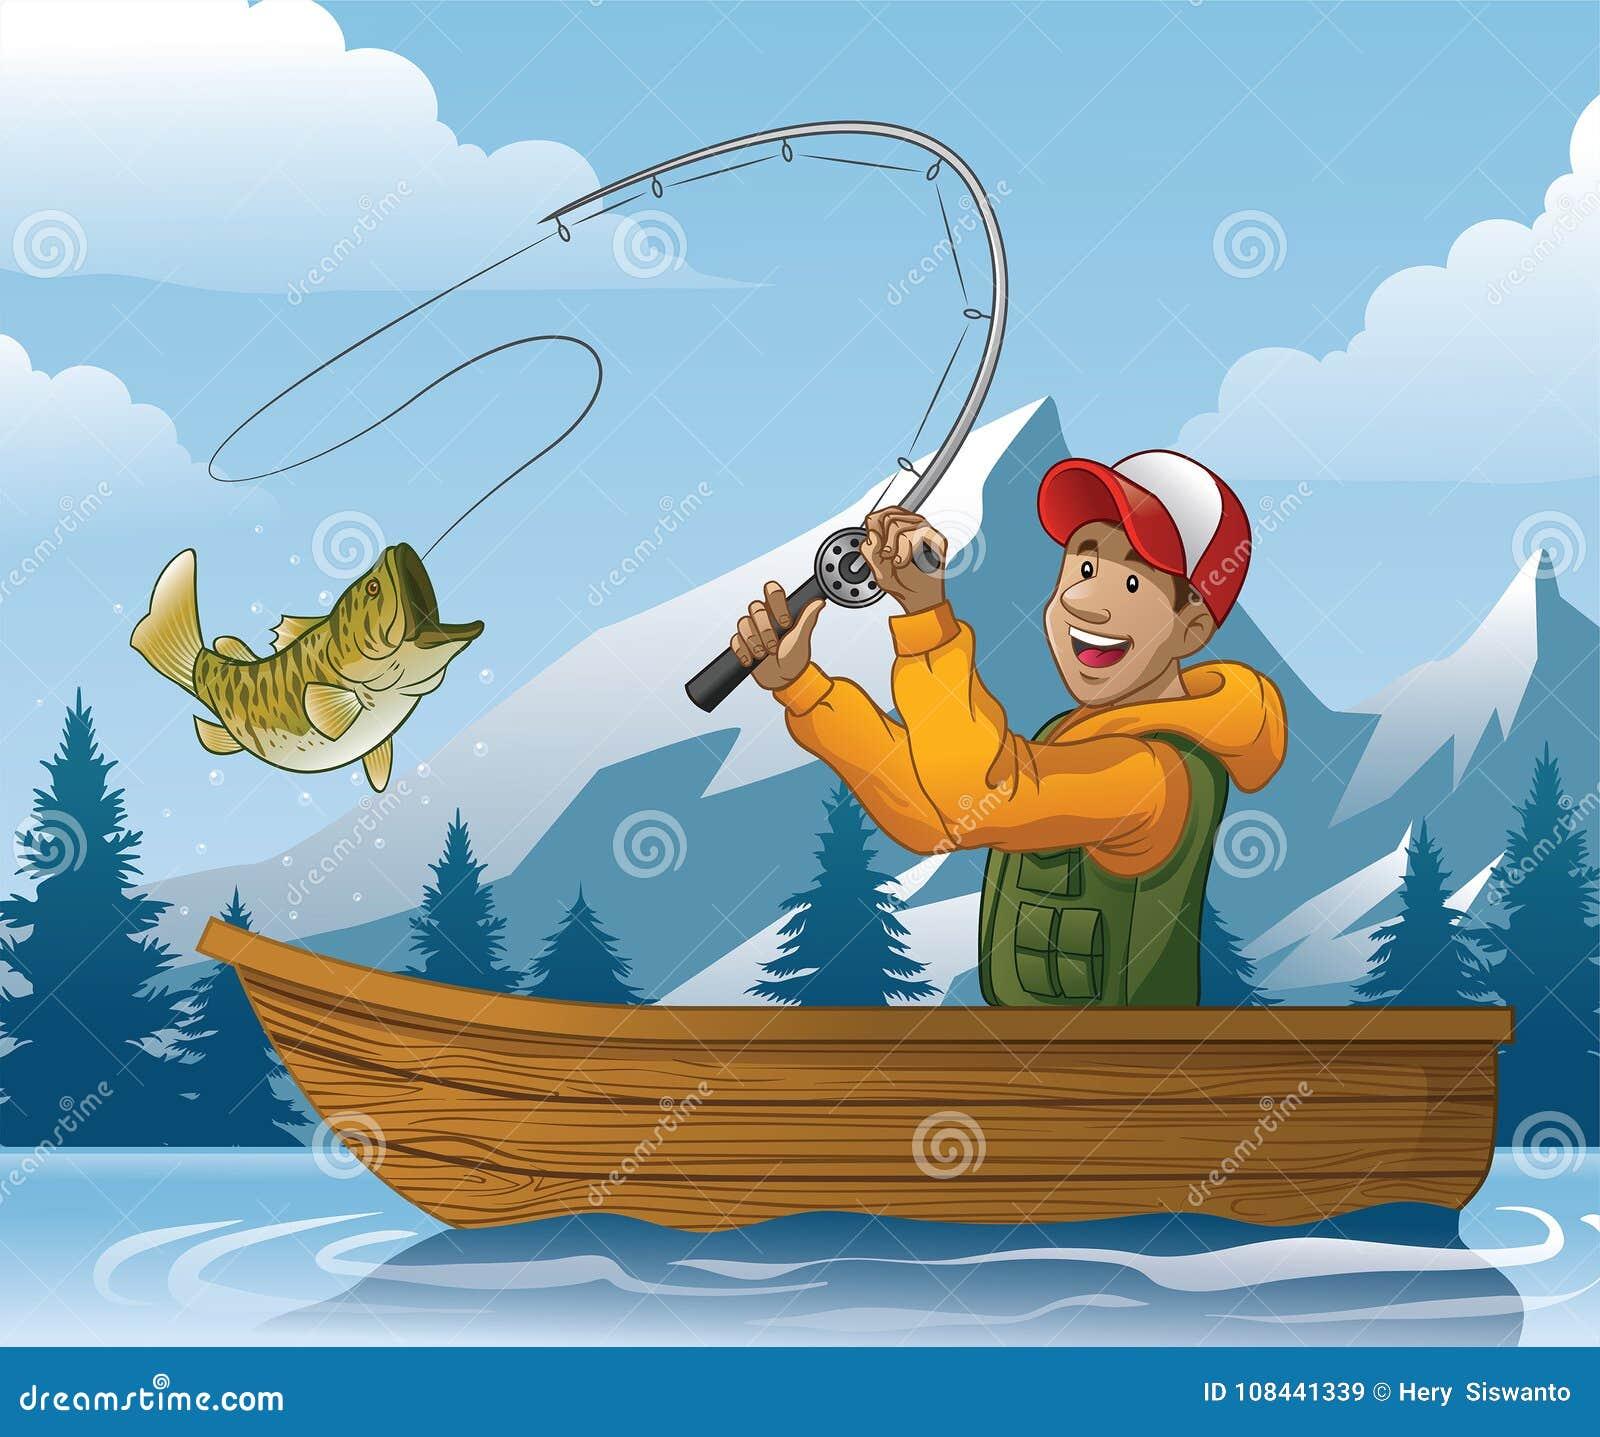 Cartoon Fishing Boat Stock Illustrations 3 991 Cartoon Fishing Boat Stock Illustrations Vectors Clipart Dreamstime